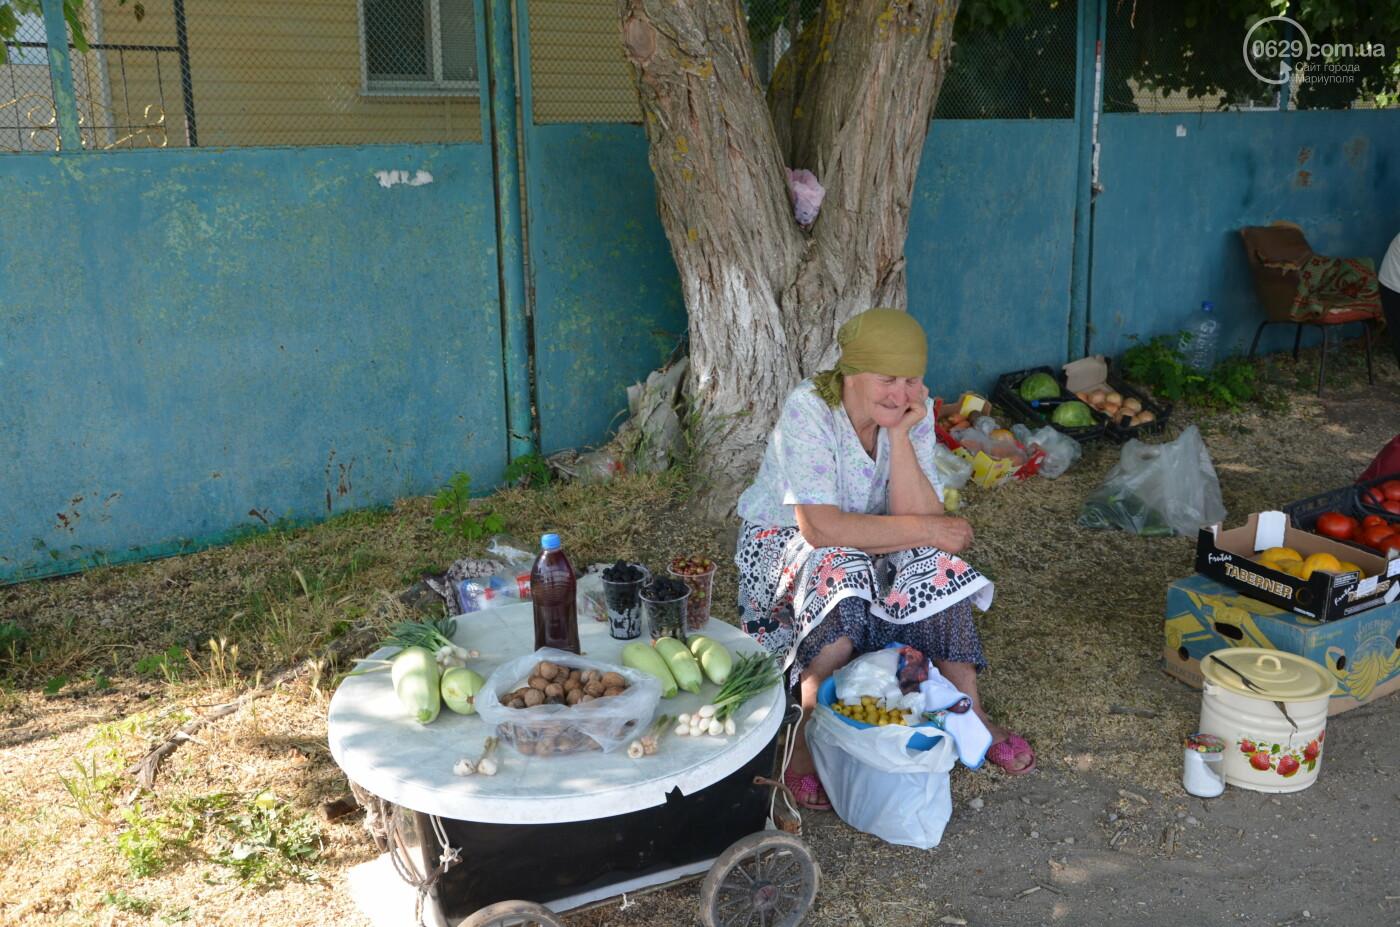 Открой Бабах-Тараму: три плюса и четыре минуса отдыха в поселке, - ФОТОРЕПОРТАЖ, фото-2